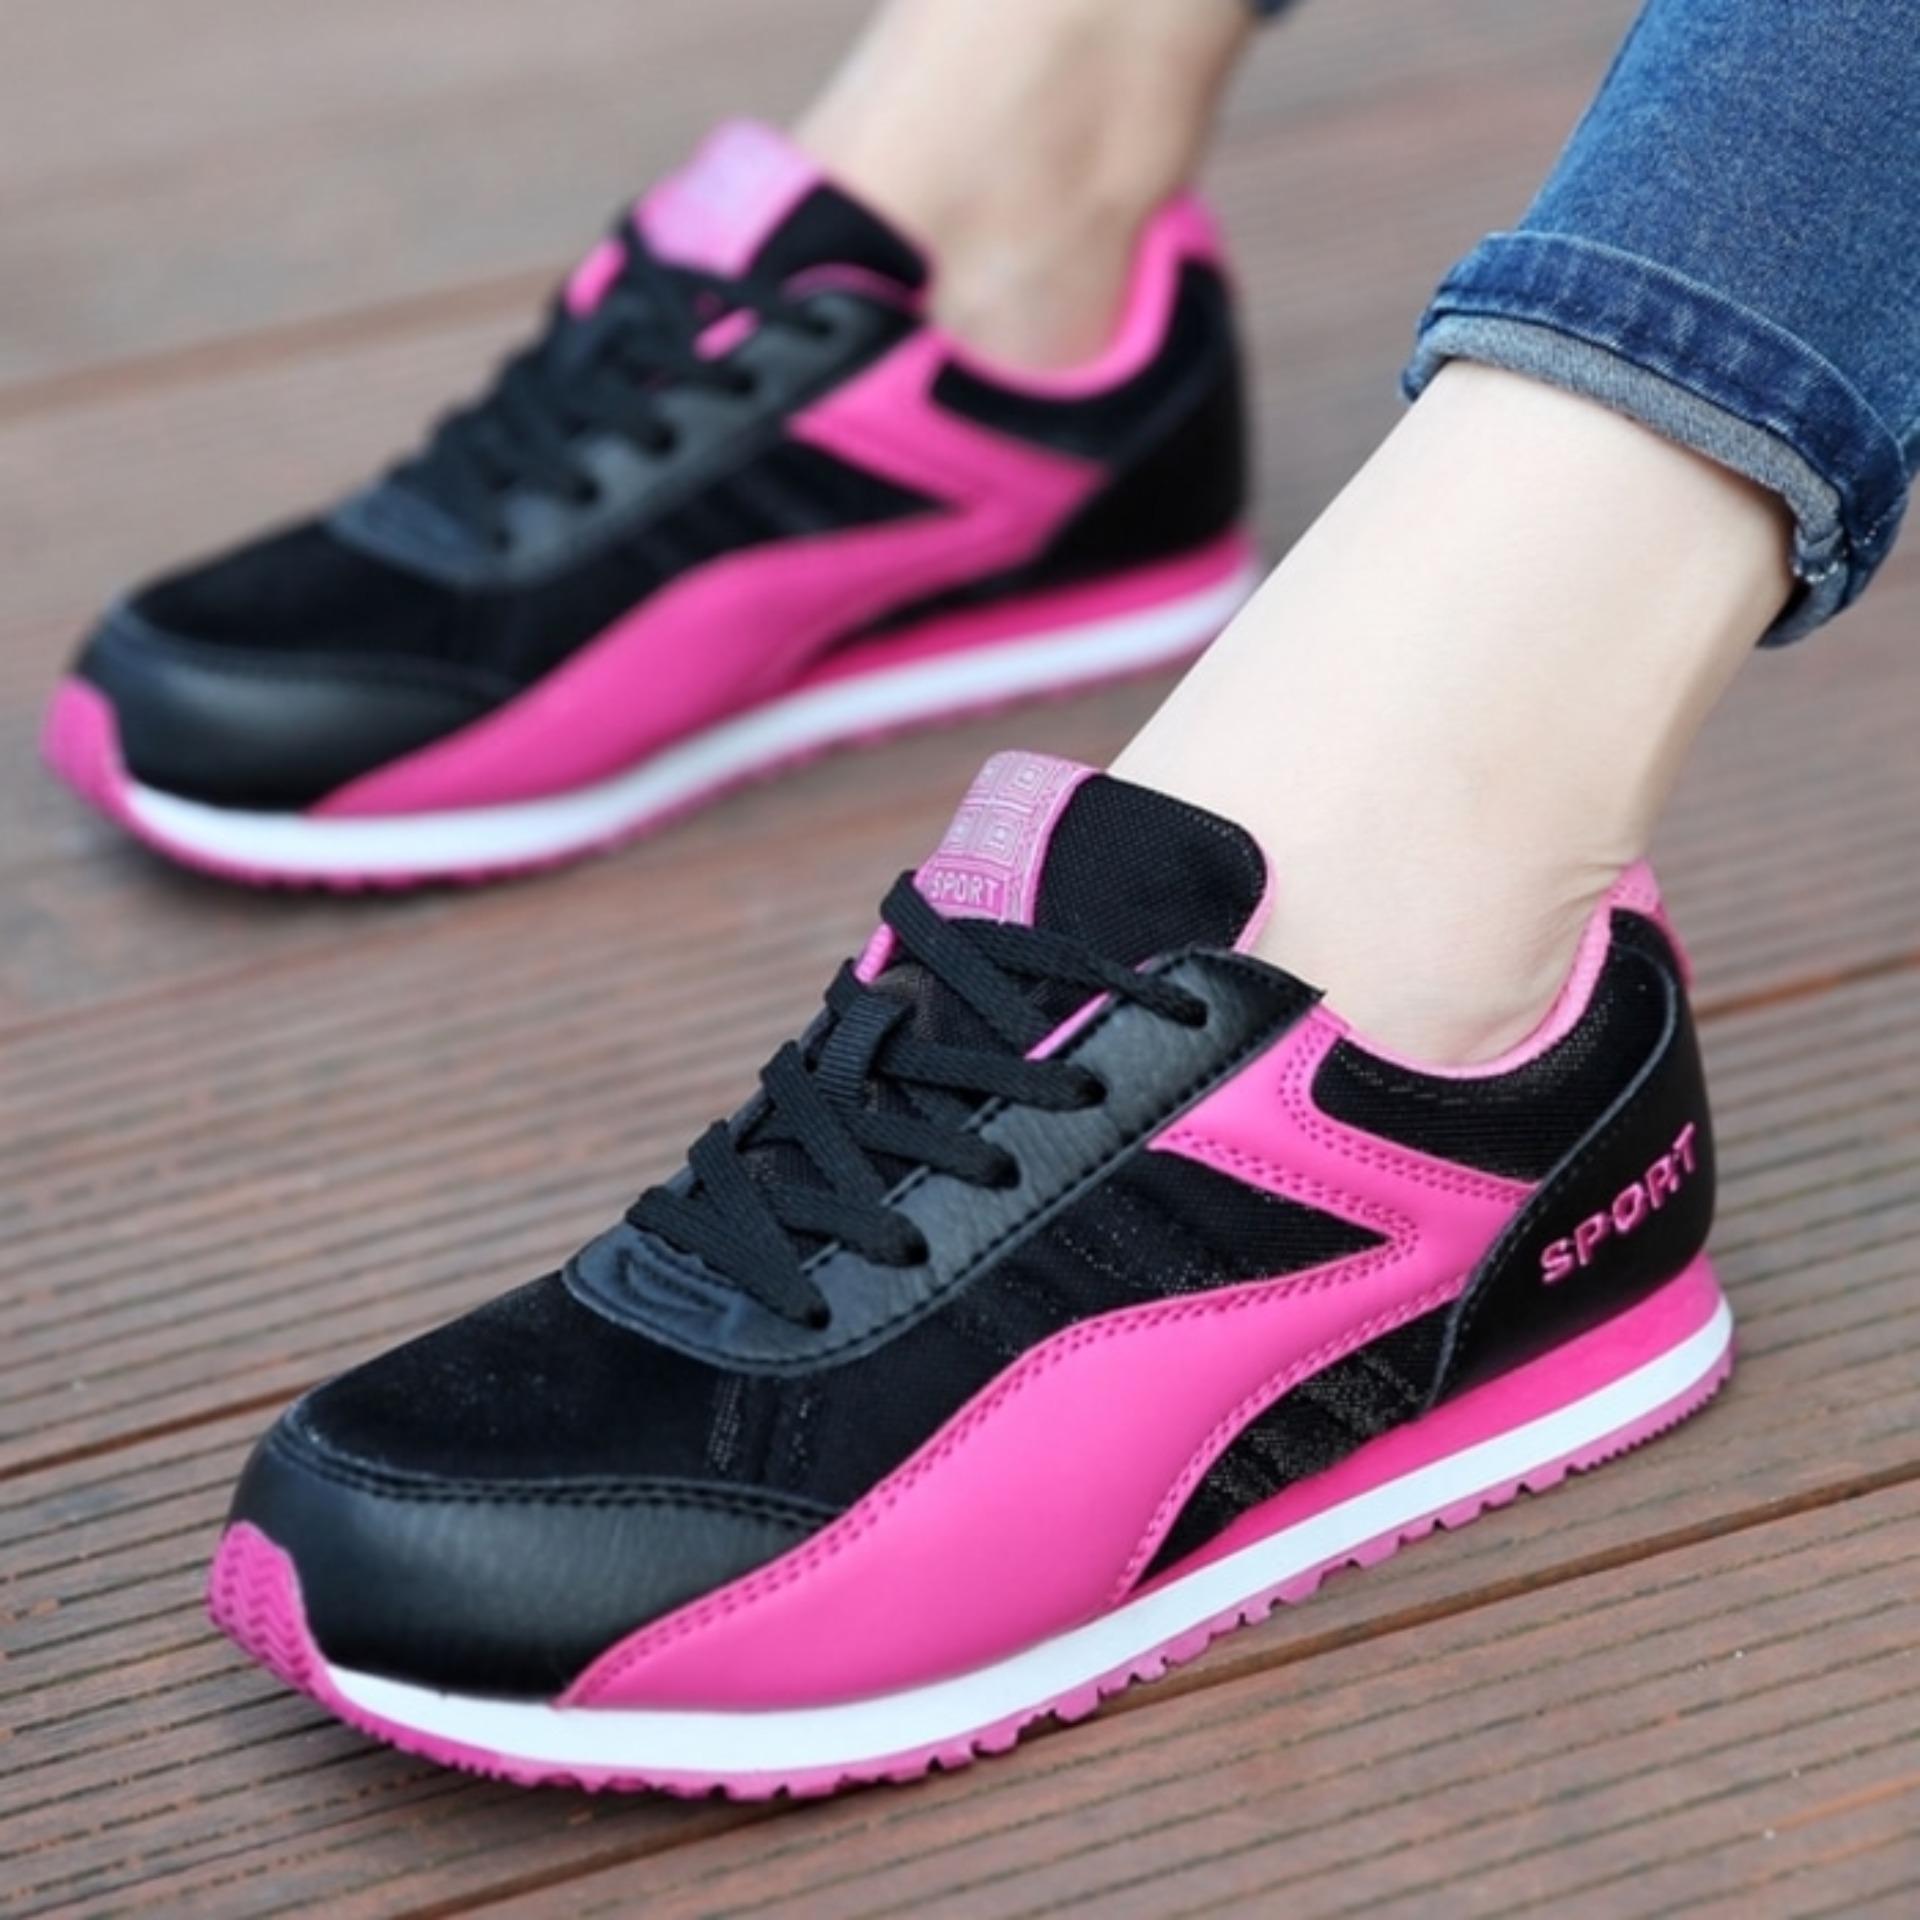 Sepatu Kets Wanita Spon All Tosca 7STAR Pria/Wanita OS Skateboard Kets Classic - Tosca Kets Spon Sport